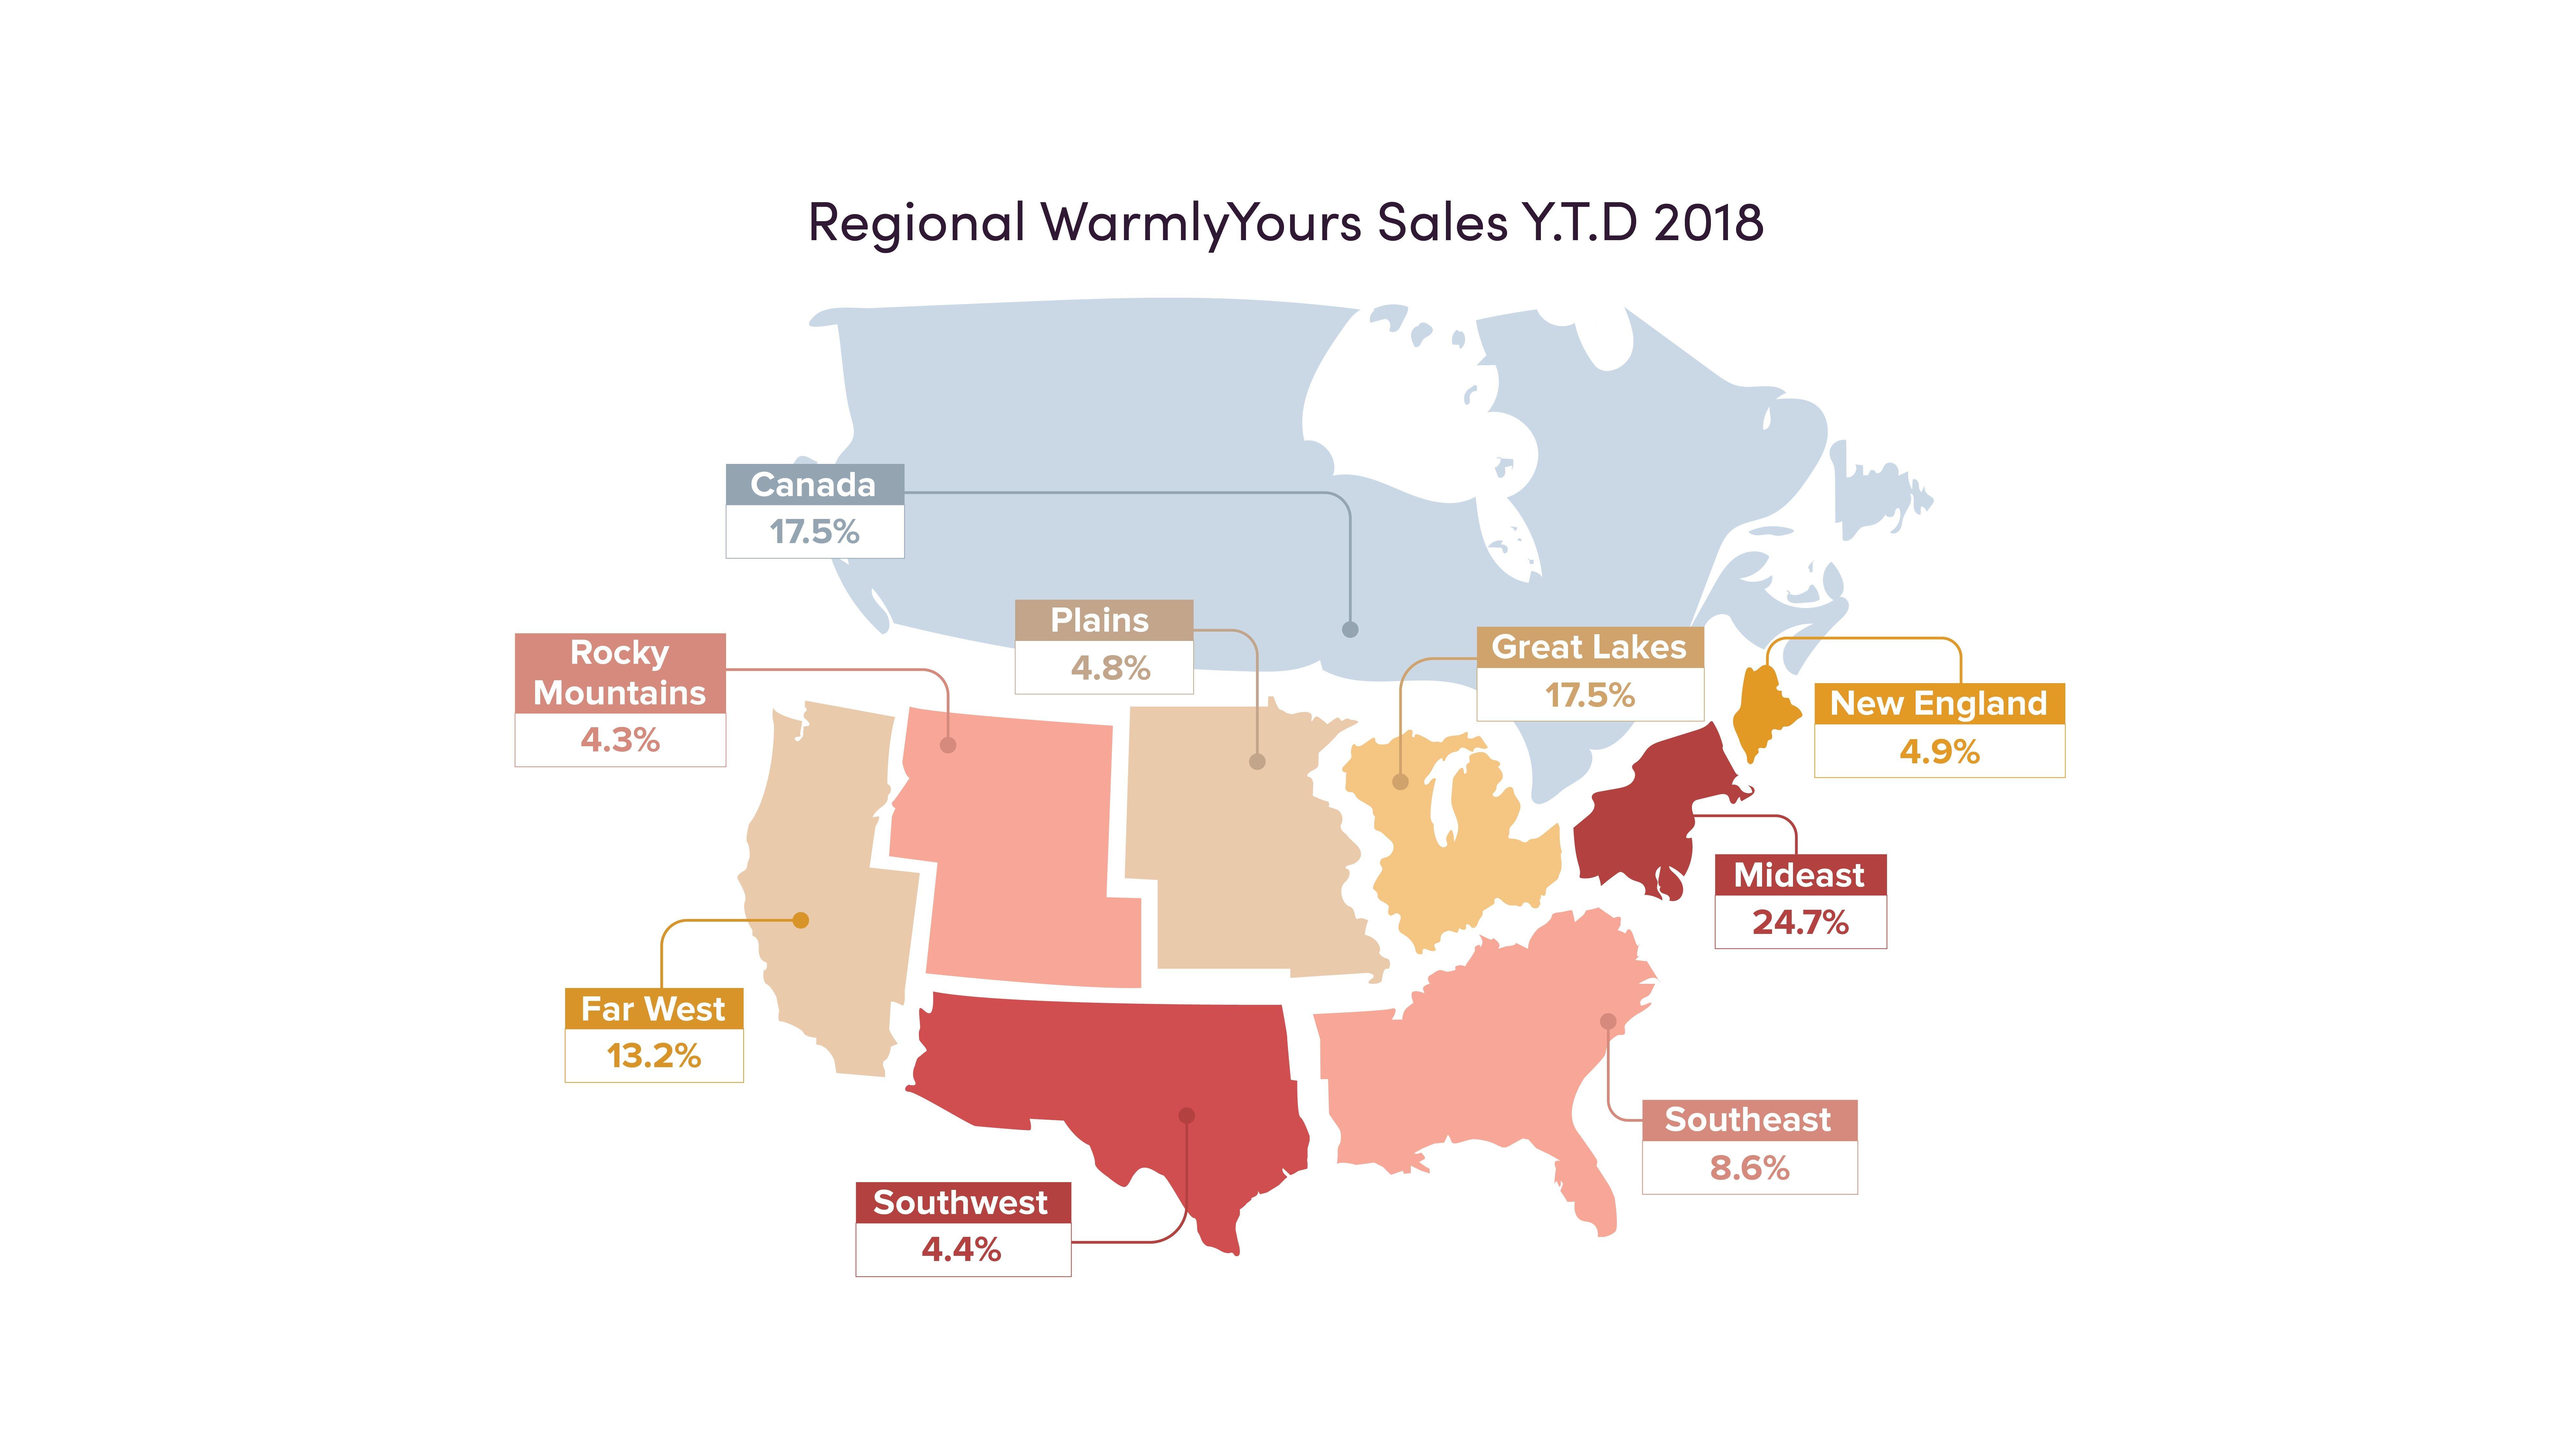 Regional WarmlyYours Sales Y.T.D 2018